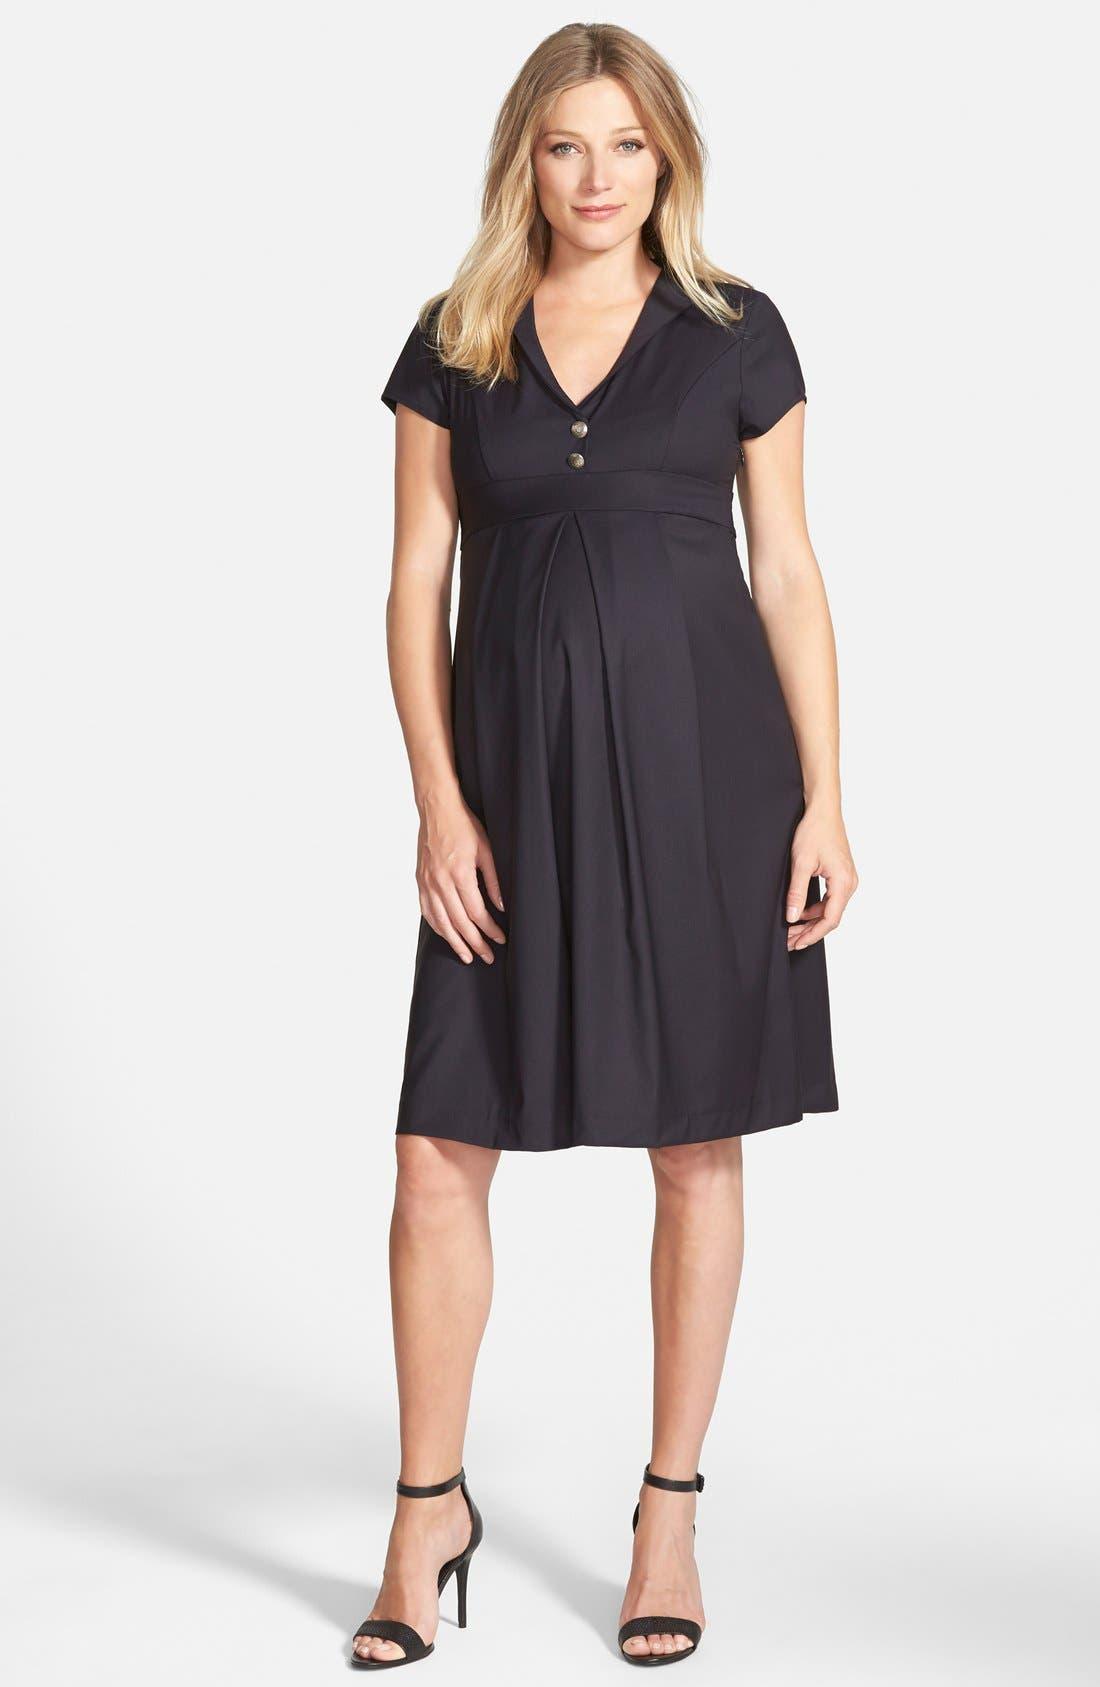 London 'Audrey' Maternity Dress,                             Main thumbnail 1, color,                             Navy